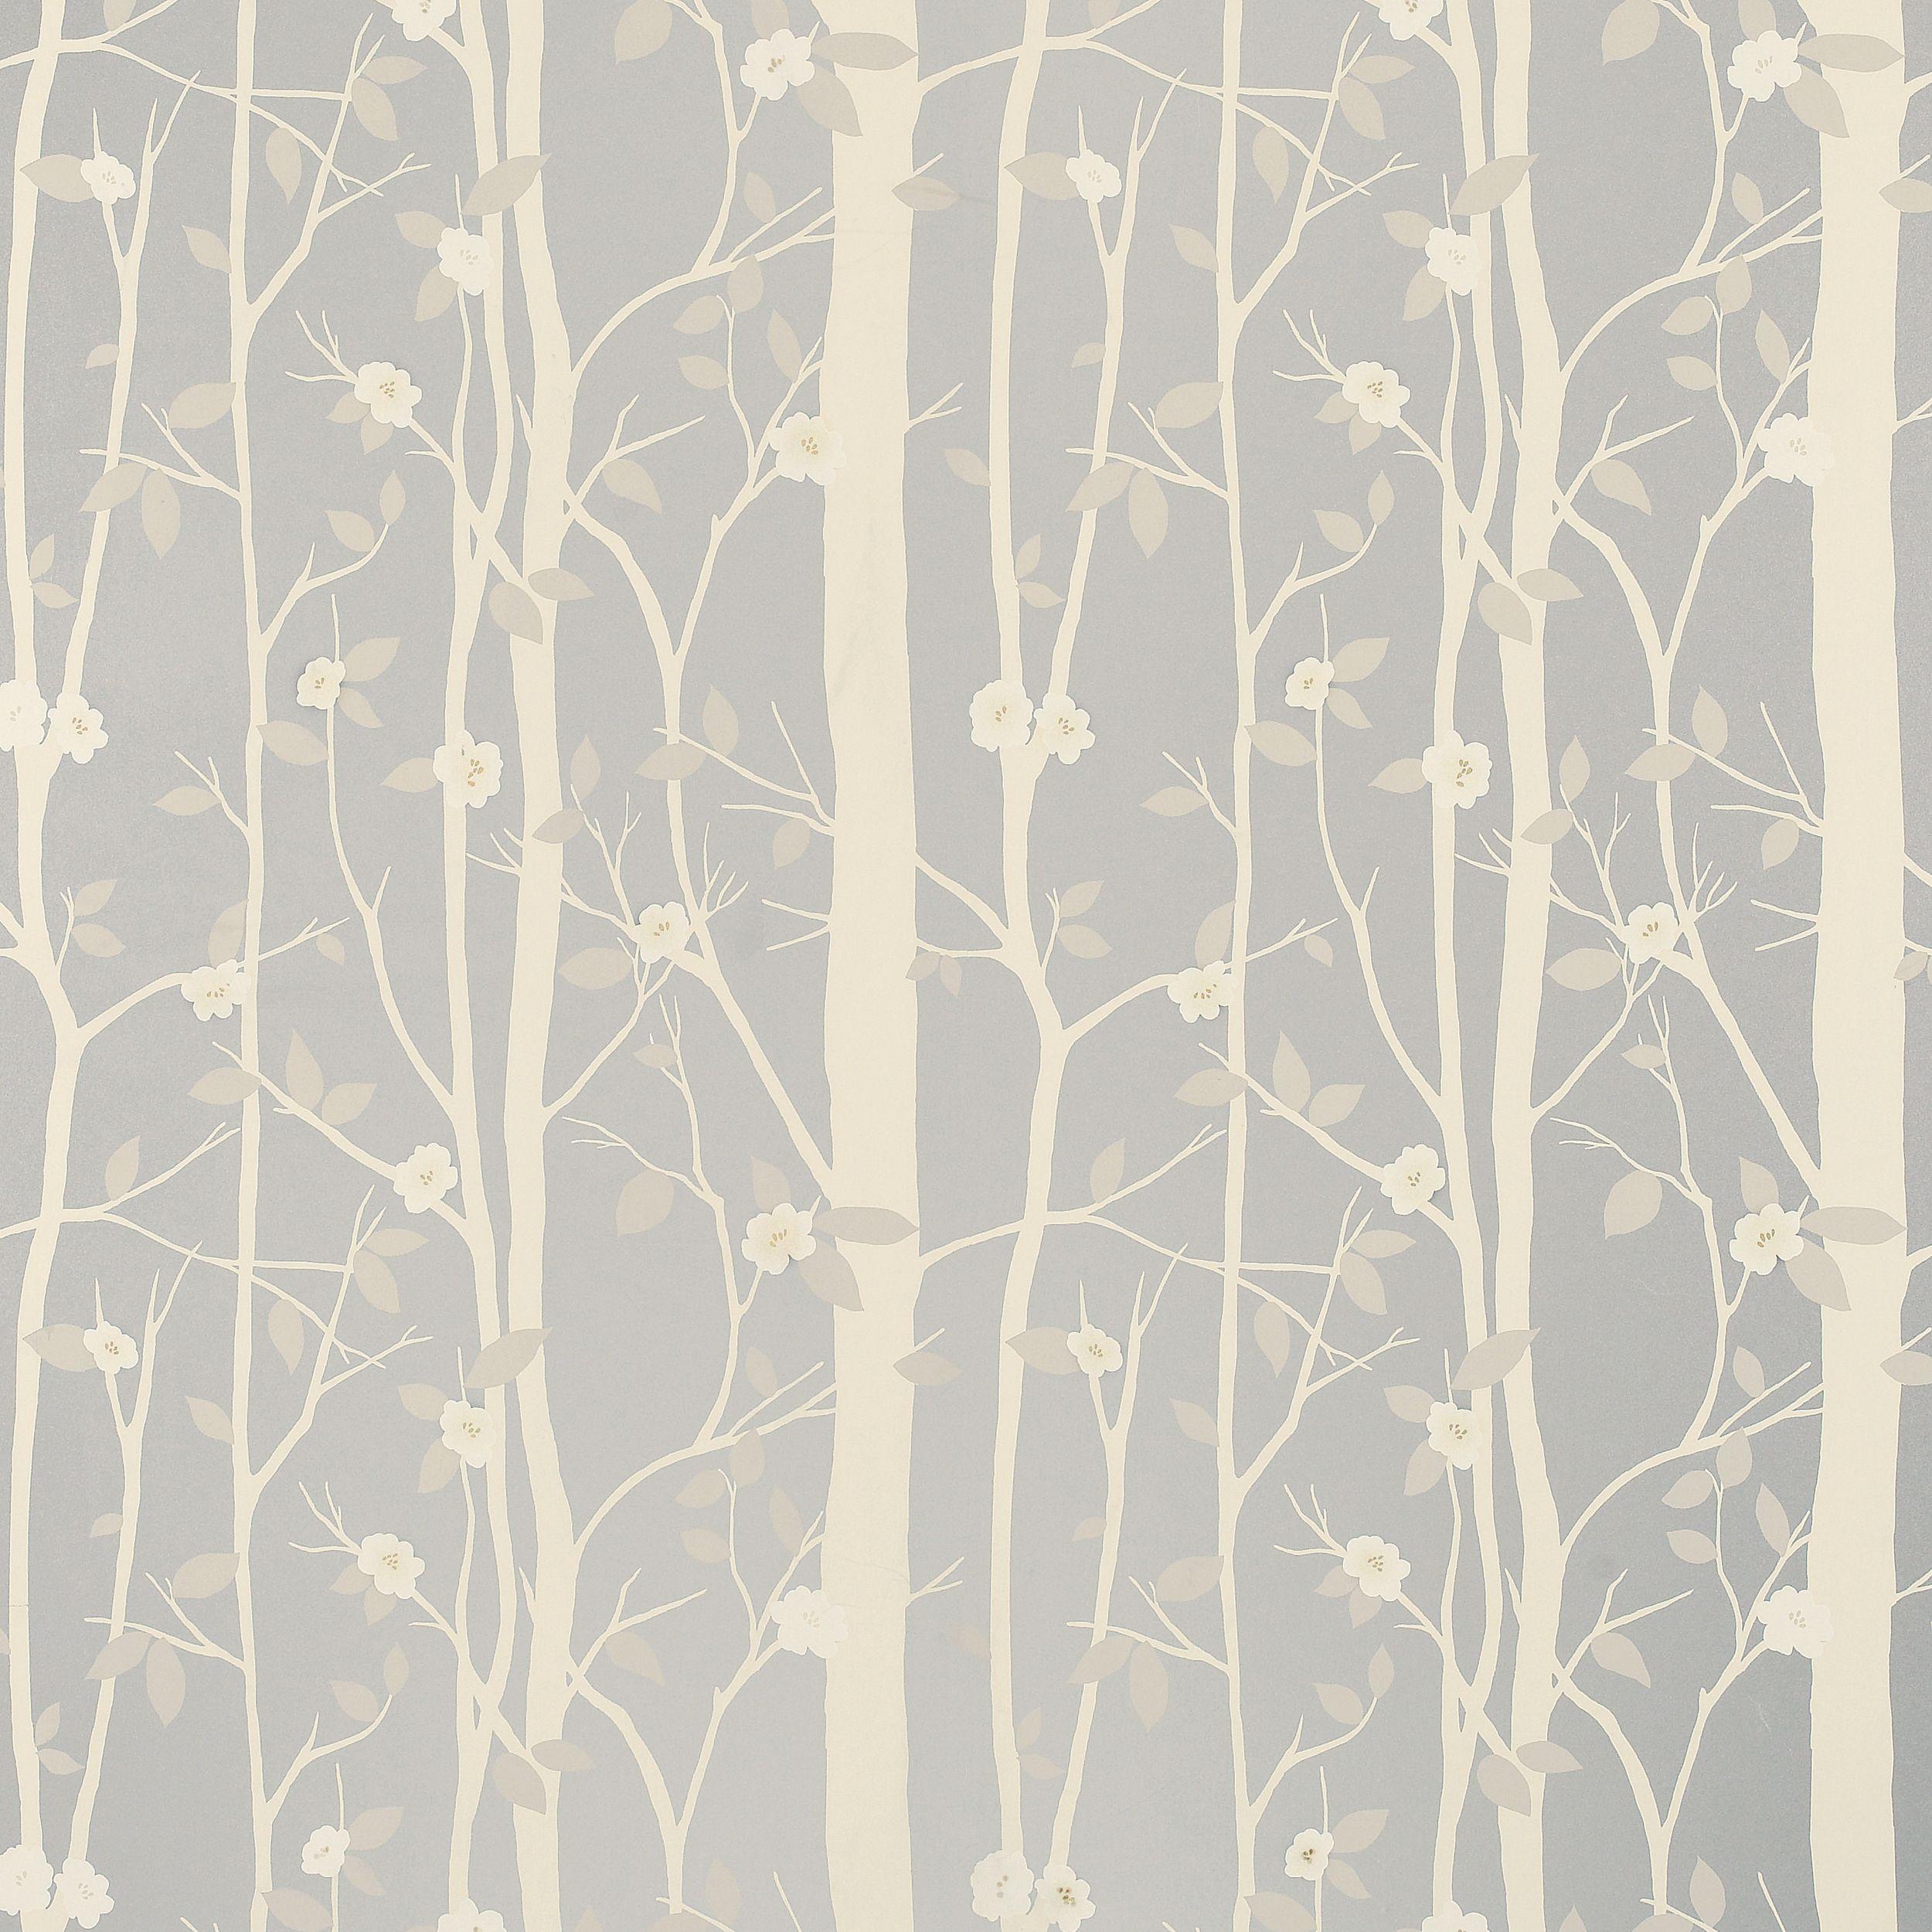 Laura Ashley Kitchen Wallpaper: Cottonwood Leaf Metallic Wallpaper, Silver